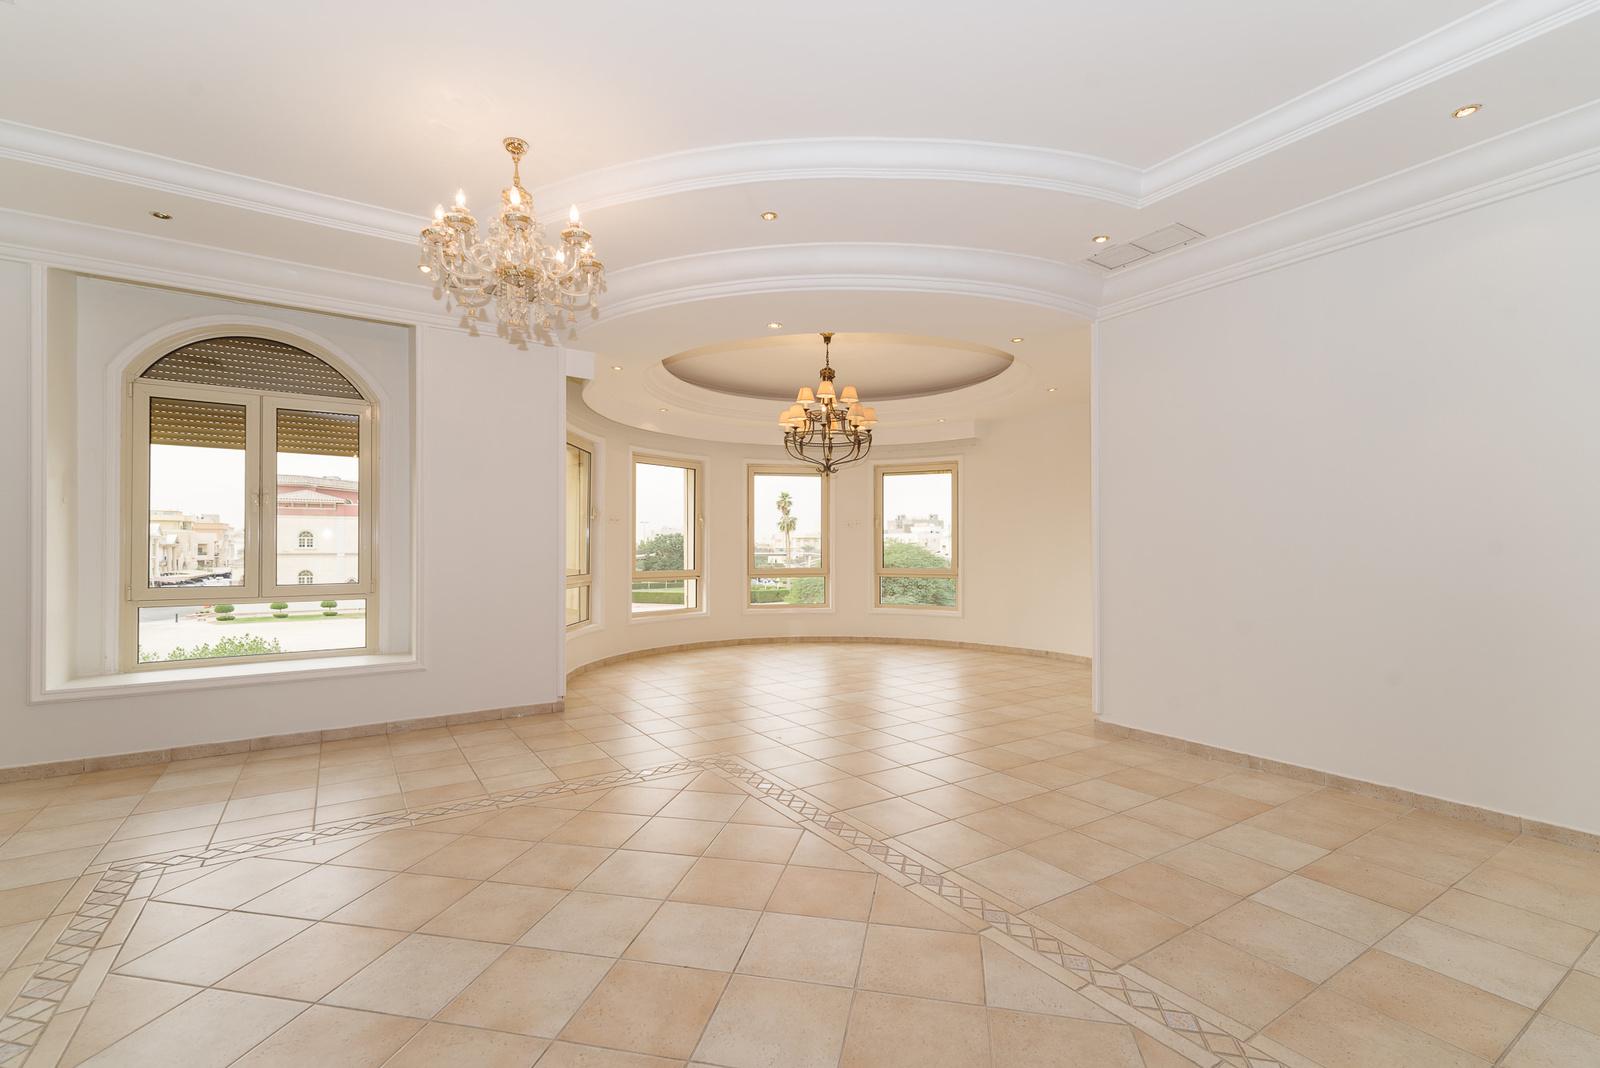 Surra – very spacious, unfurnished four bedroom floor